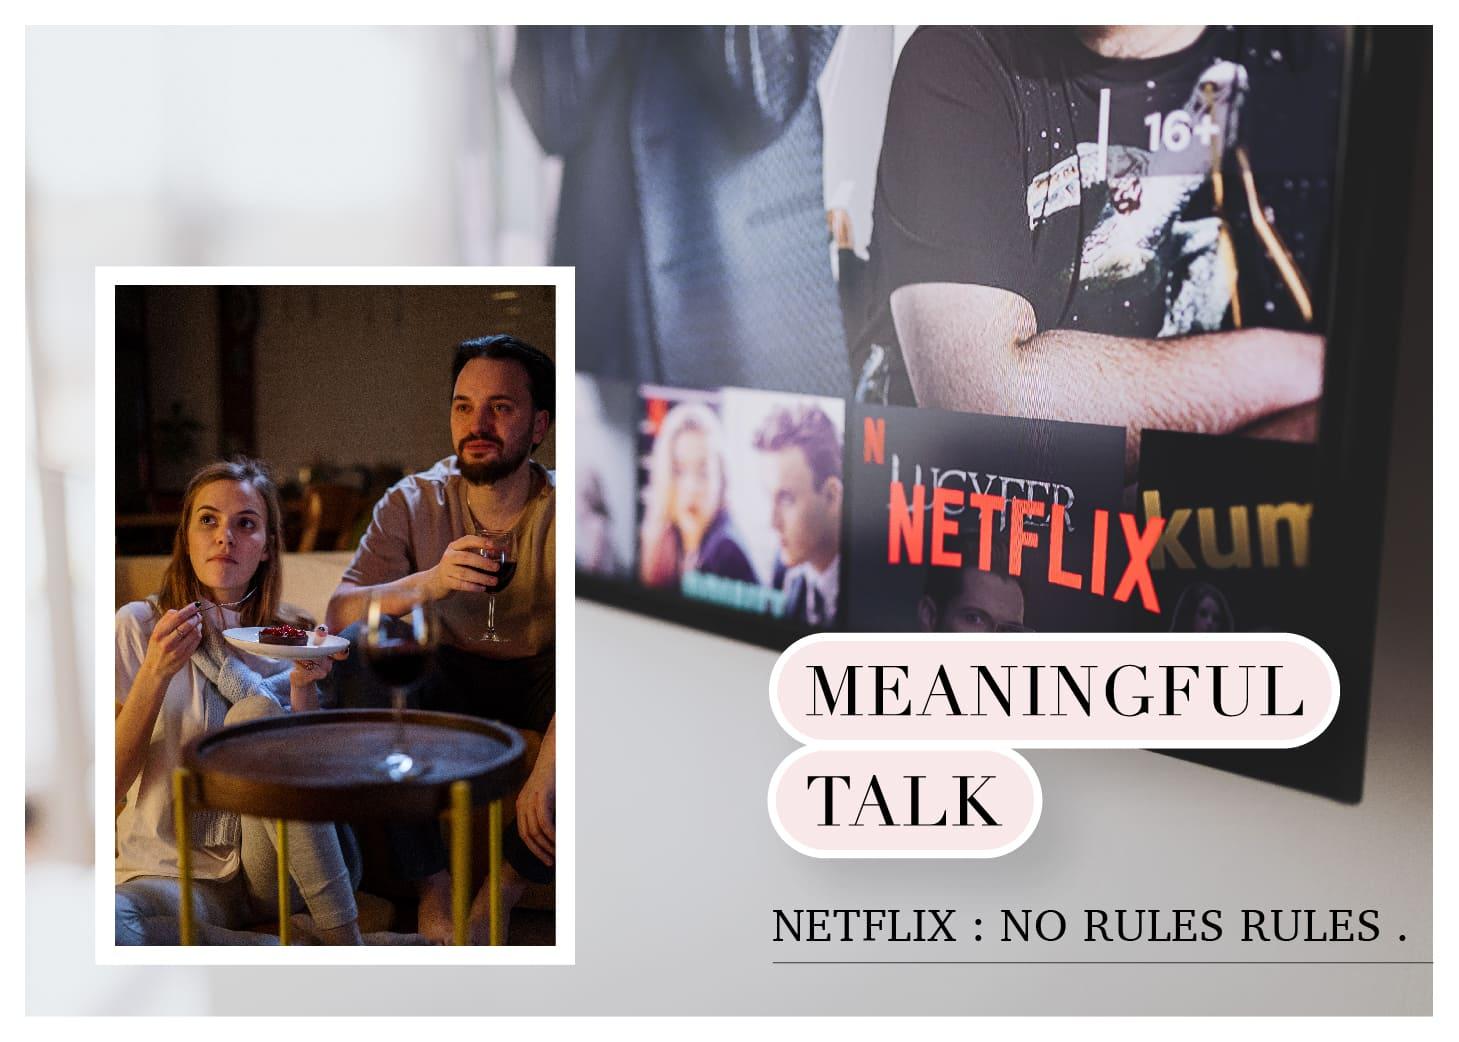 Cultural Difference between USA and Taiwan!迷人說 Meaningful Talk 「零規則,是最高級的準則」Netflix執行長的創業管理必修課